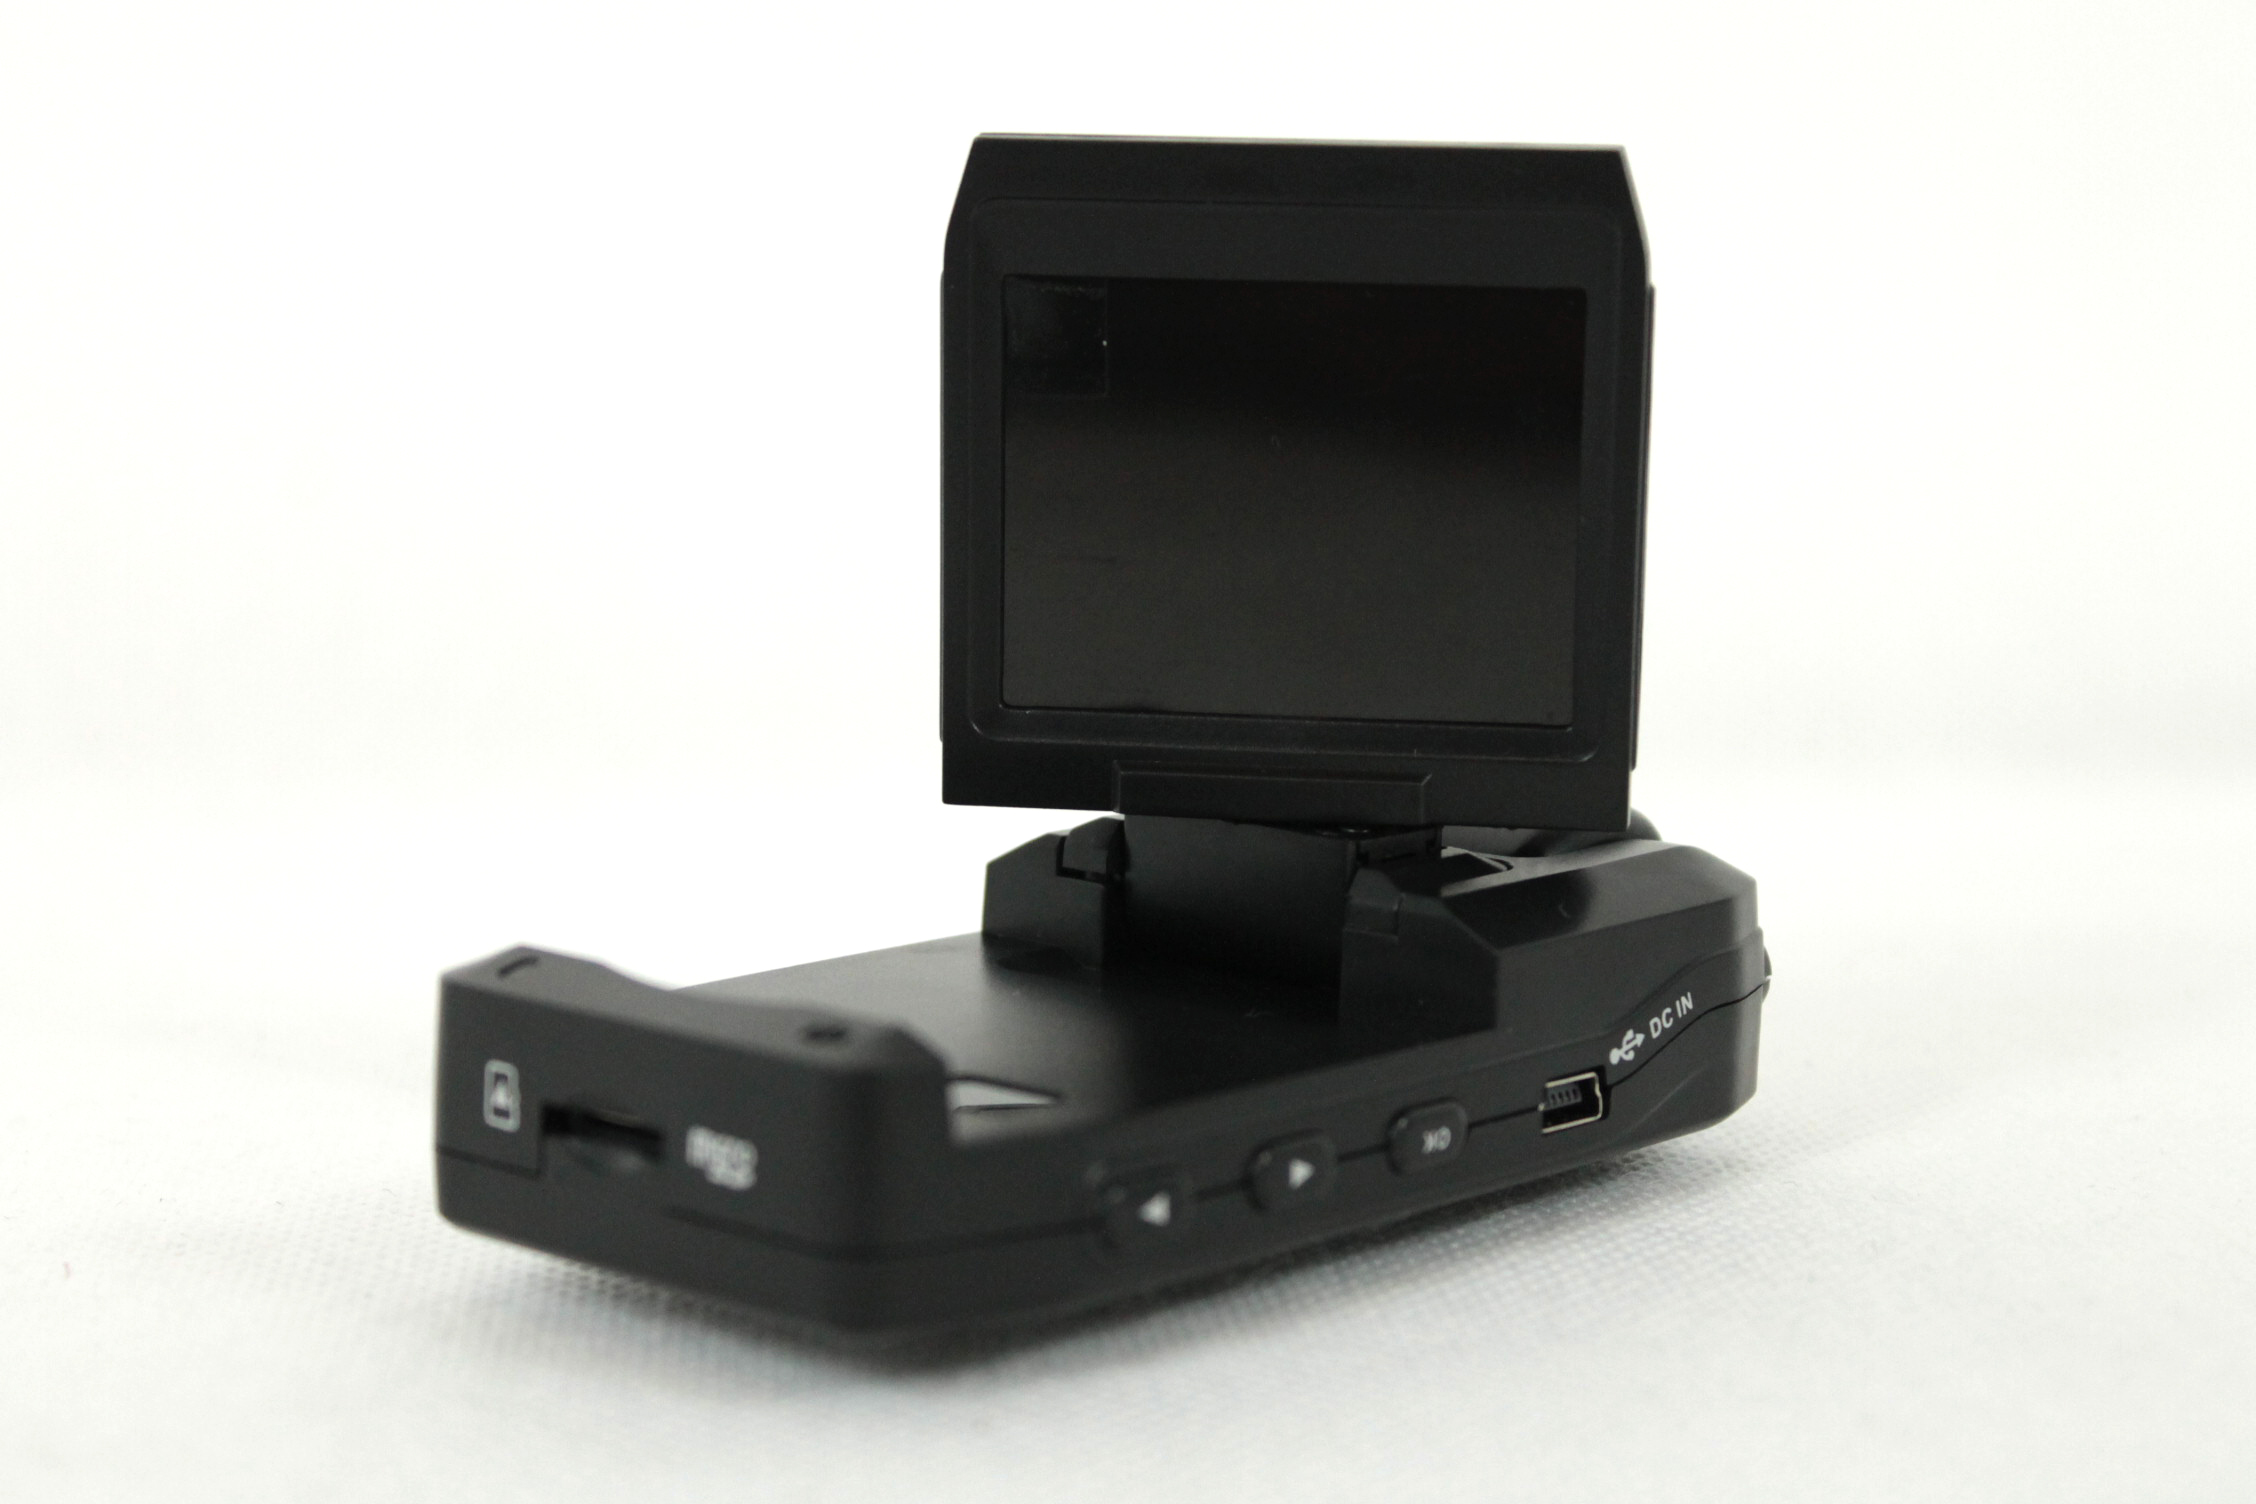 hd tft lcd auto kfz farb monitor kamera 1280x960 cam. Black Bedroom Furniture Sets. Home Design Ideas